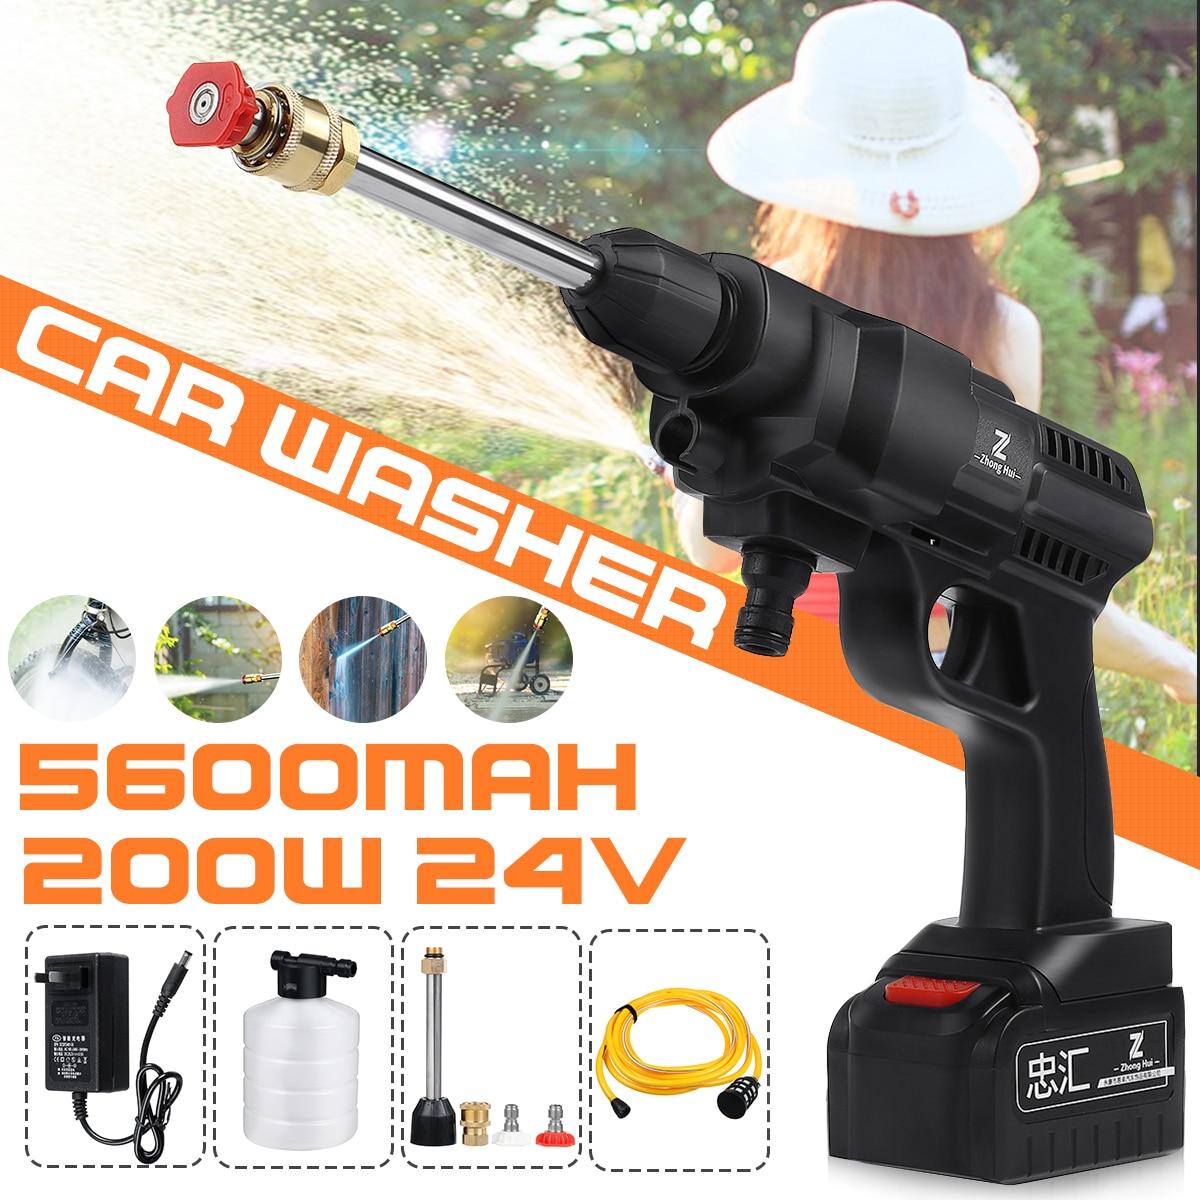 24V 120/156/200W Cordless High Pressure Car Washer Gun Handheld Auto Spray Powerful Car Washer Garden Water Jet 5600mAh Battery